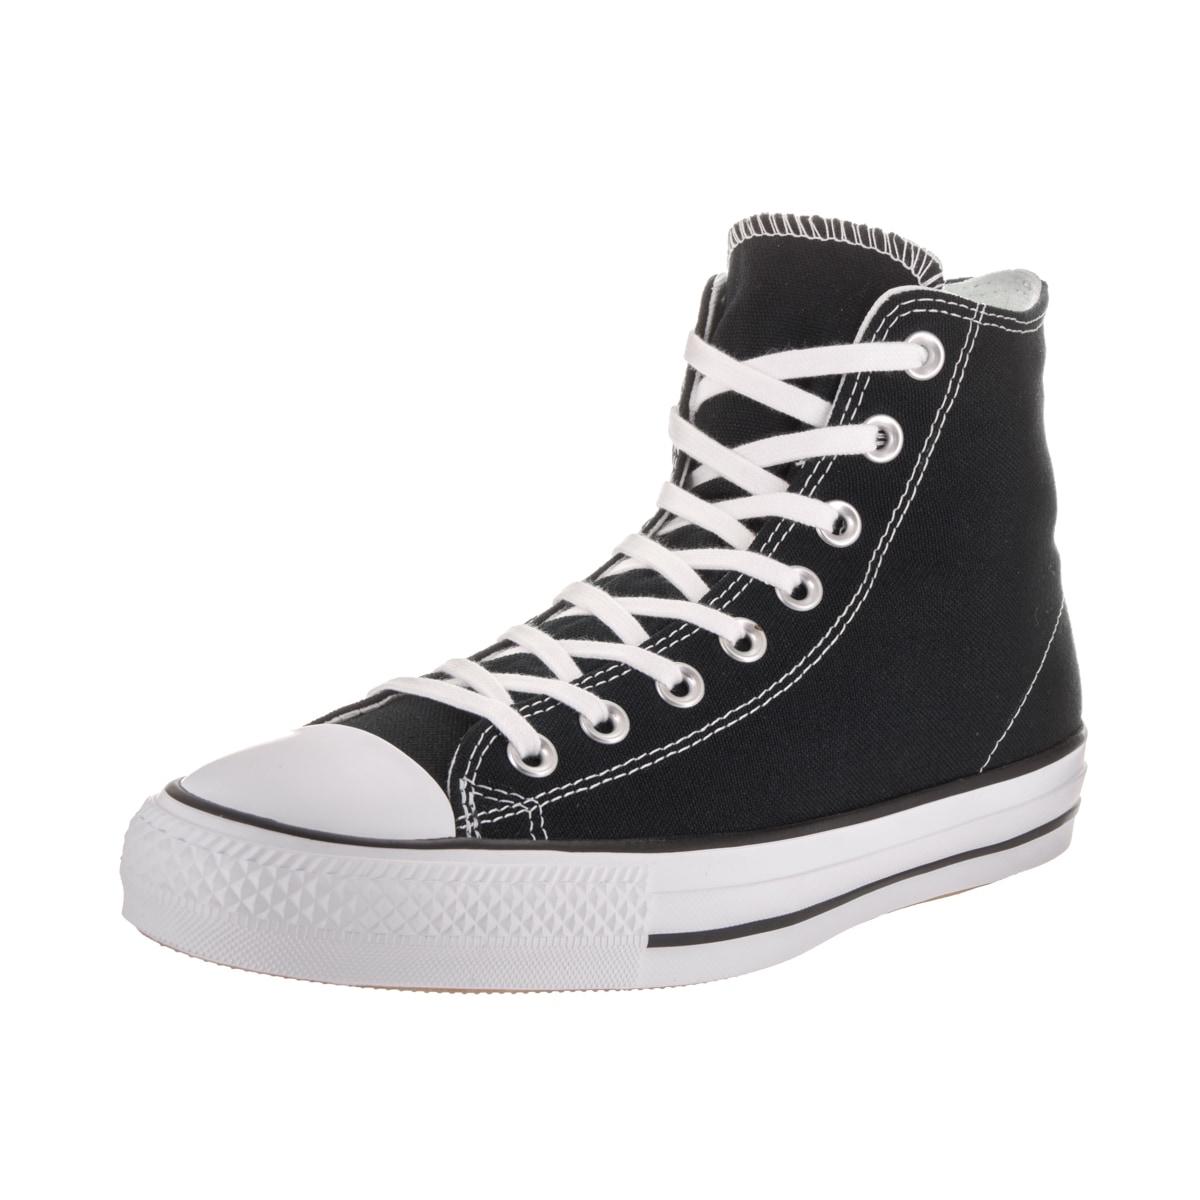 converse chuck taylor all star basketball shoes